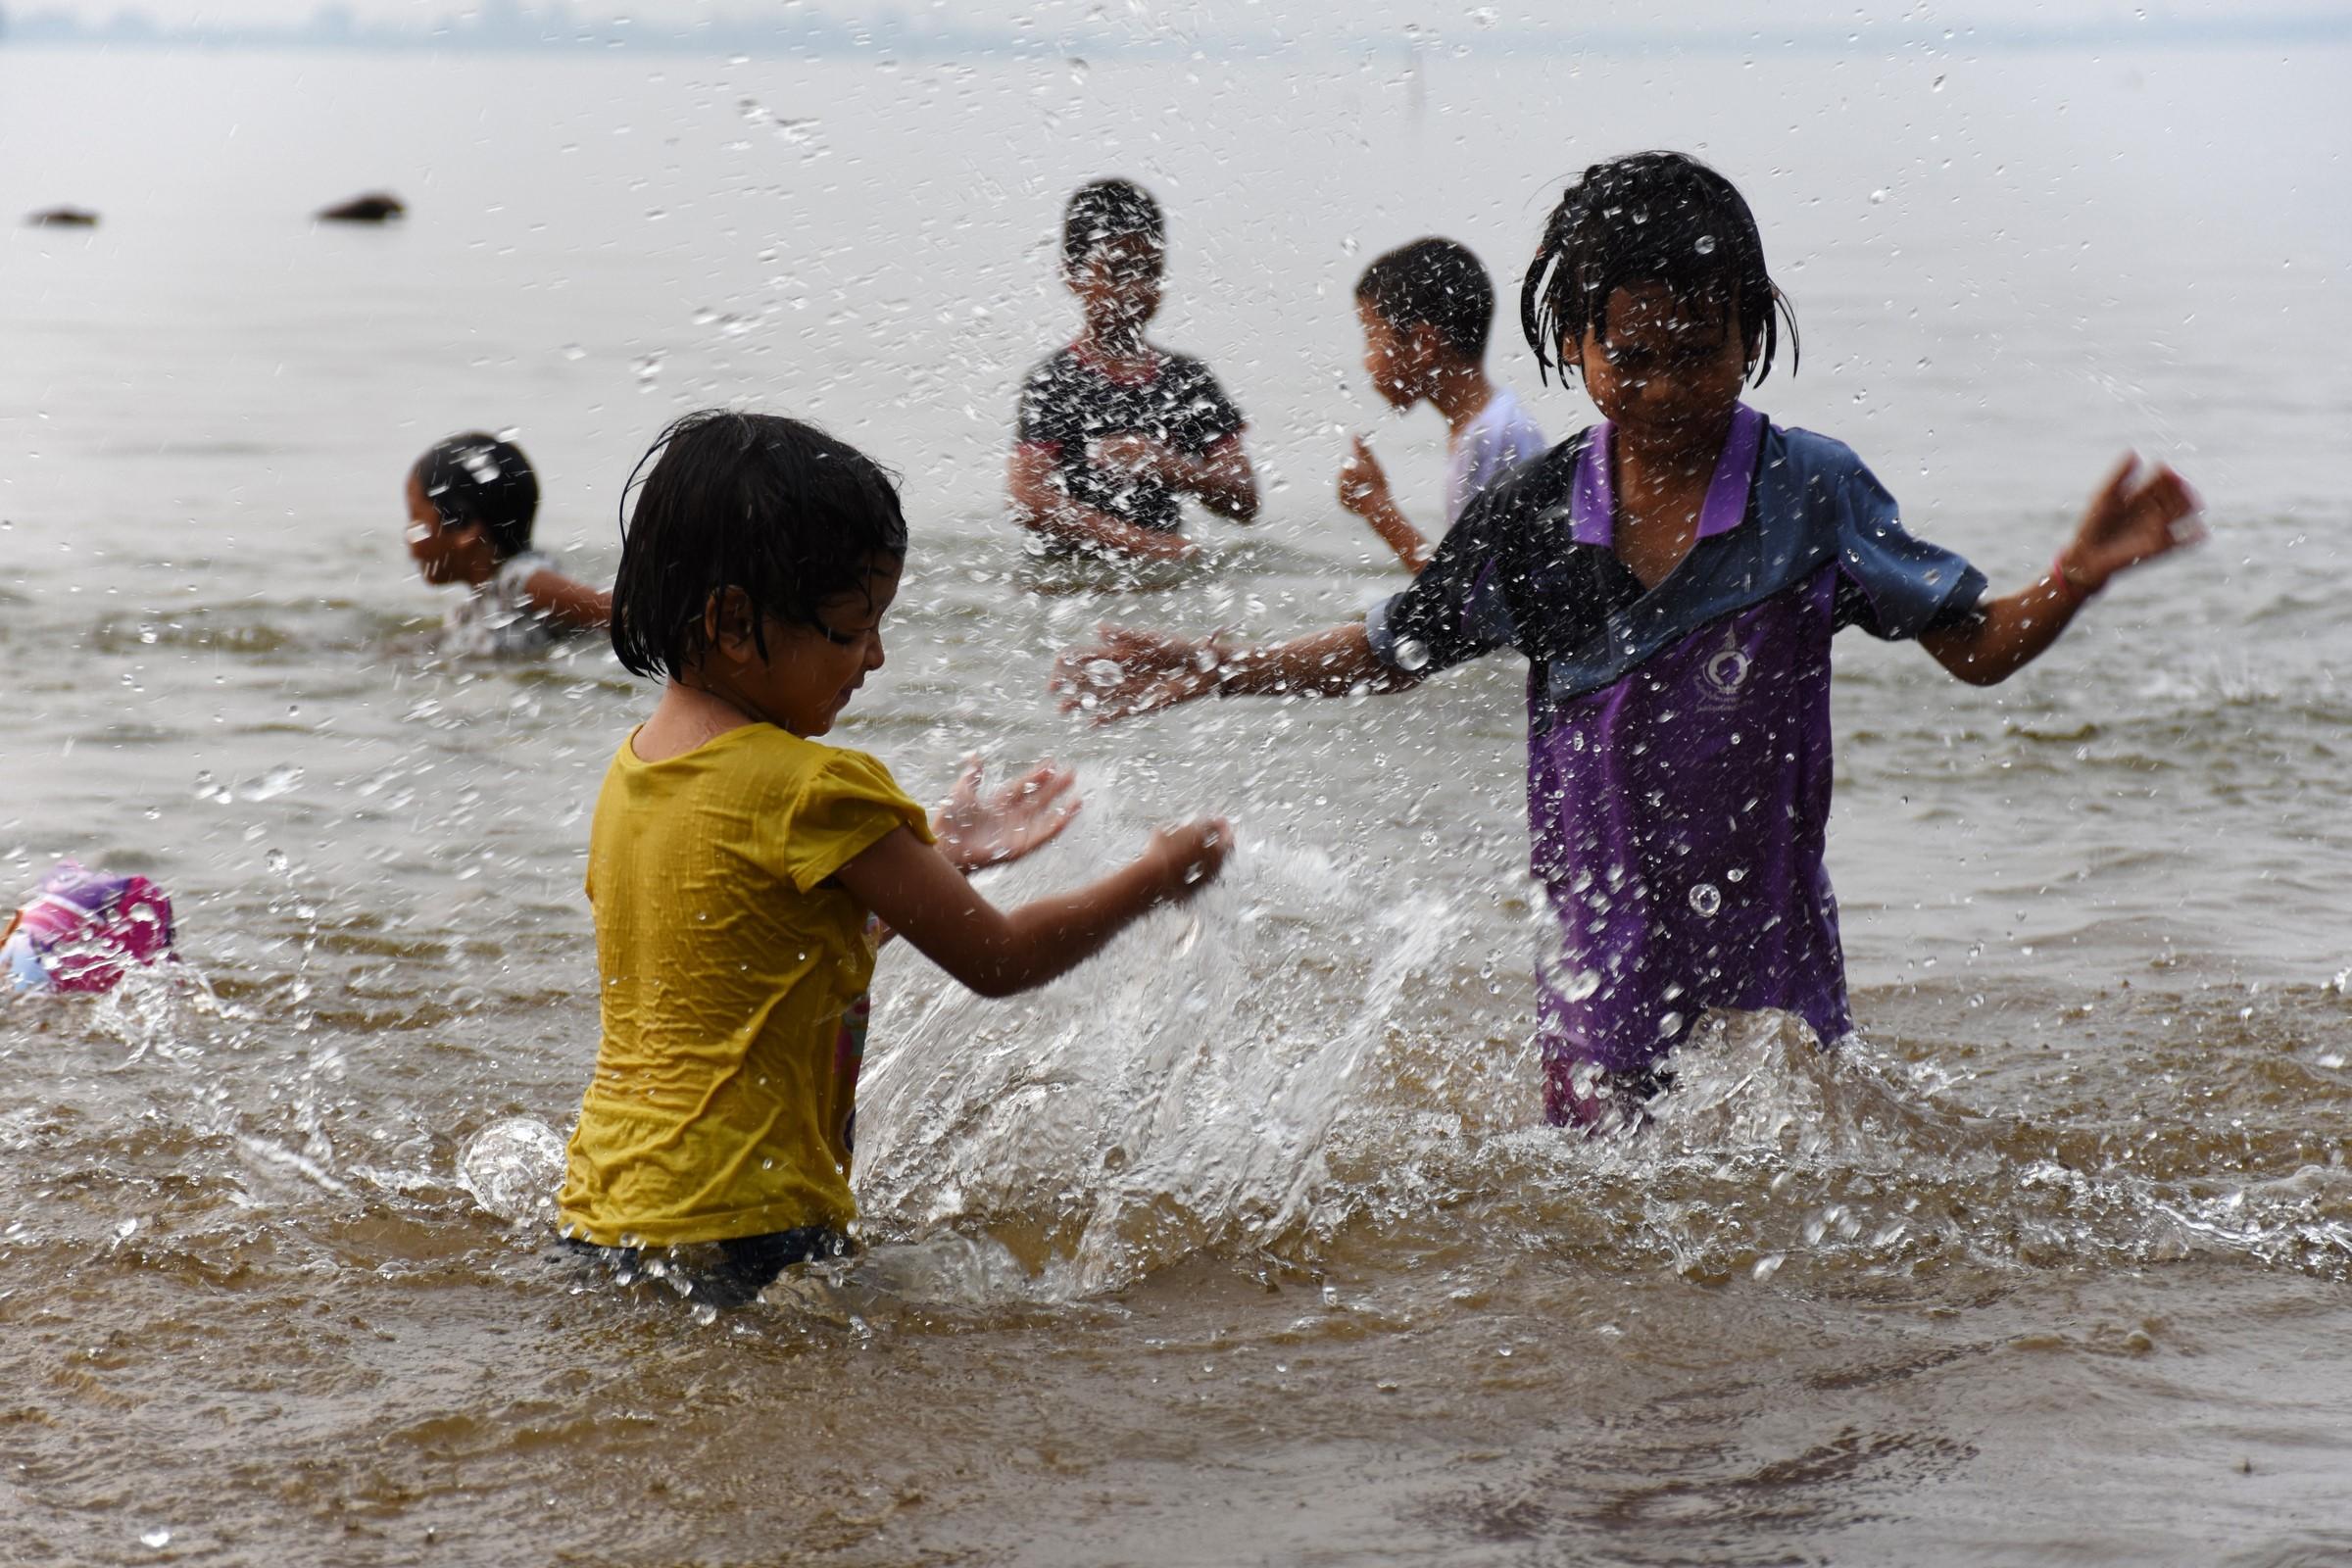 BBC News | ASIA-PACIFIC | Vietnam flood victims face crocs